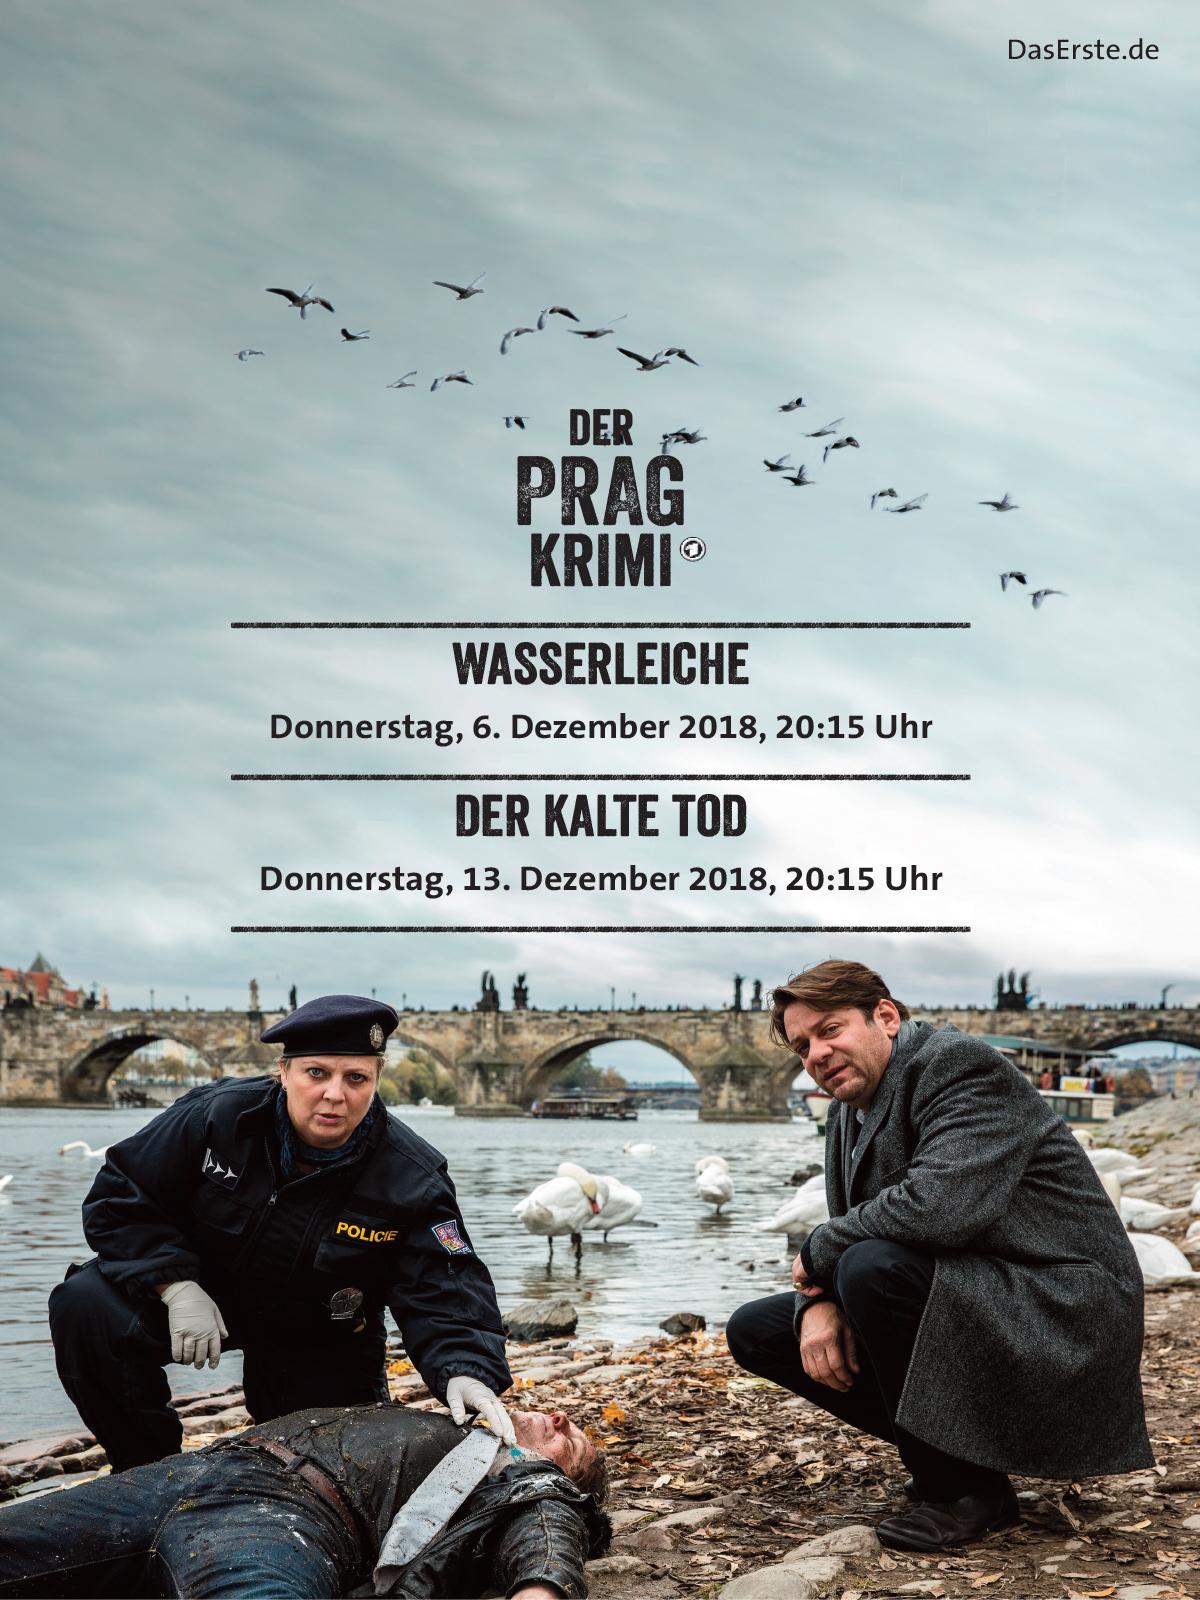 Prag Krimi Der Kalte Tod